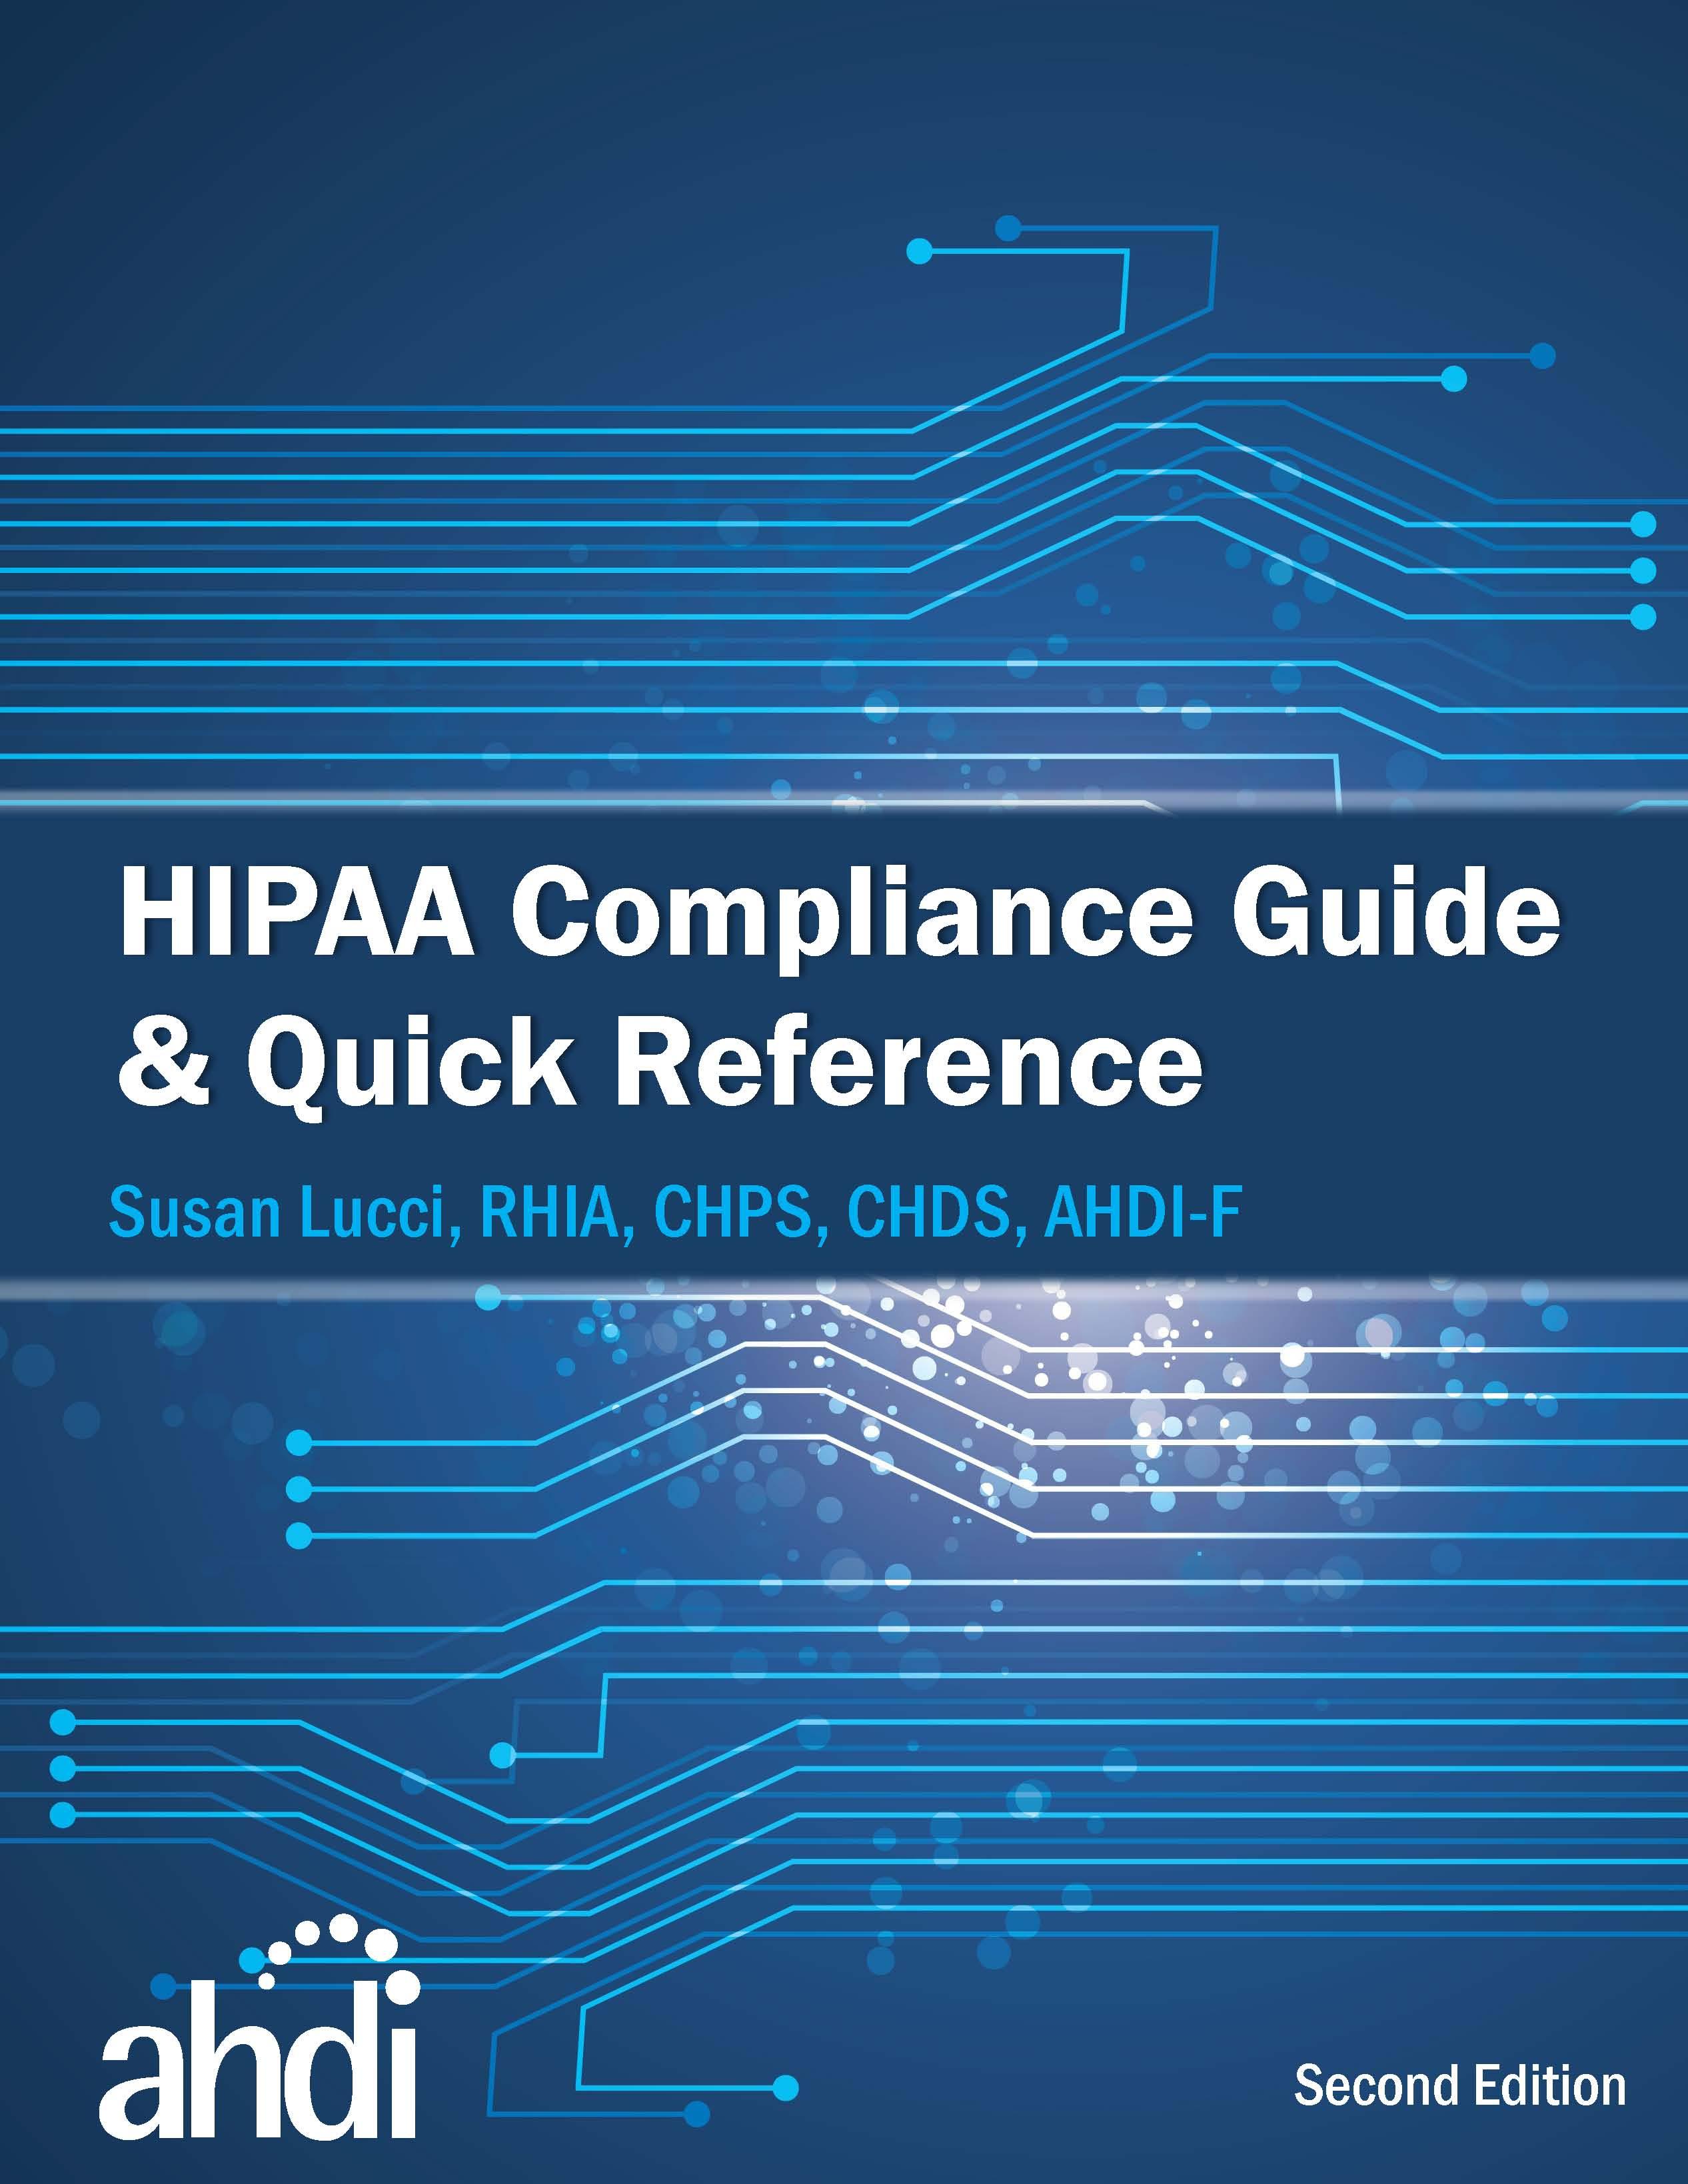 HIPAA Compliance - Association for Healthcare Documentation Integrity